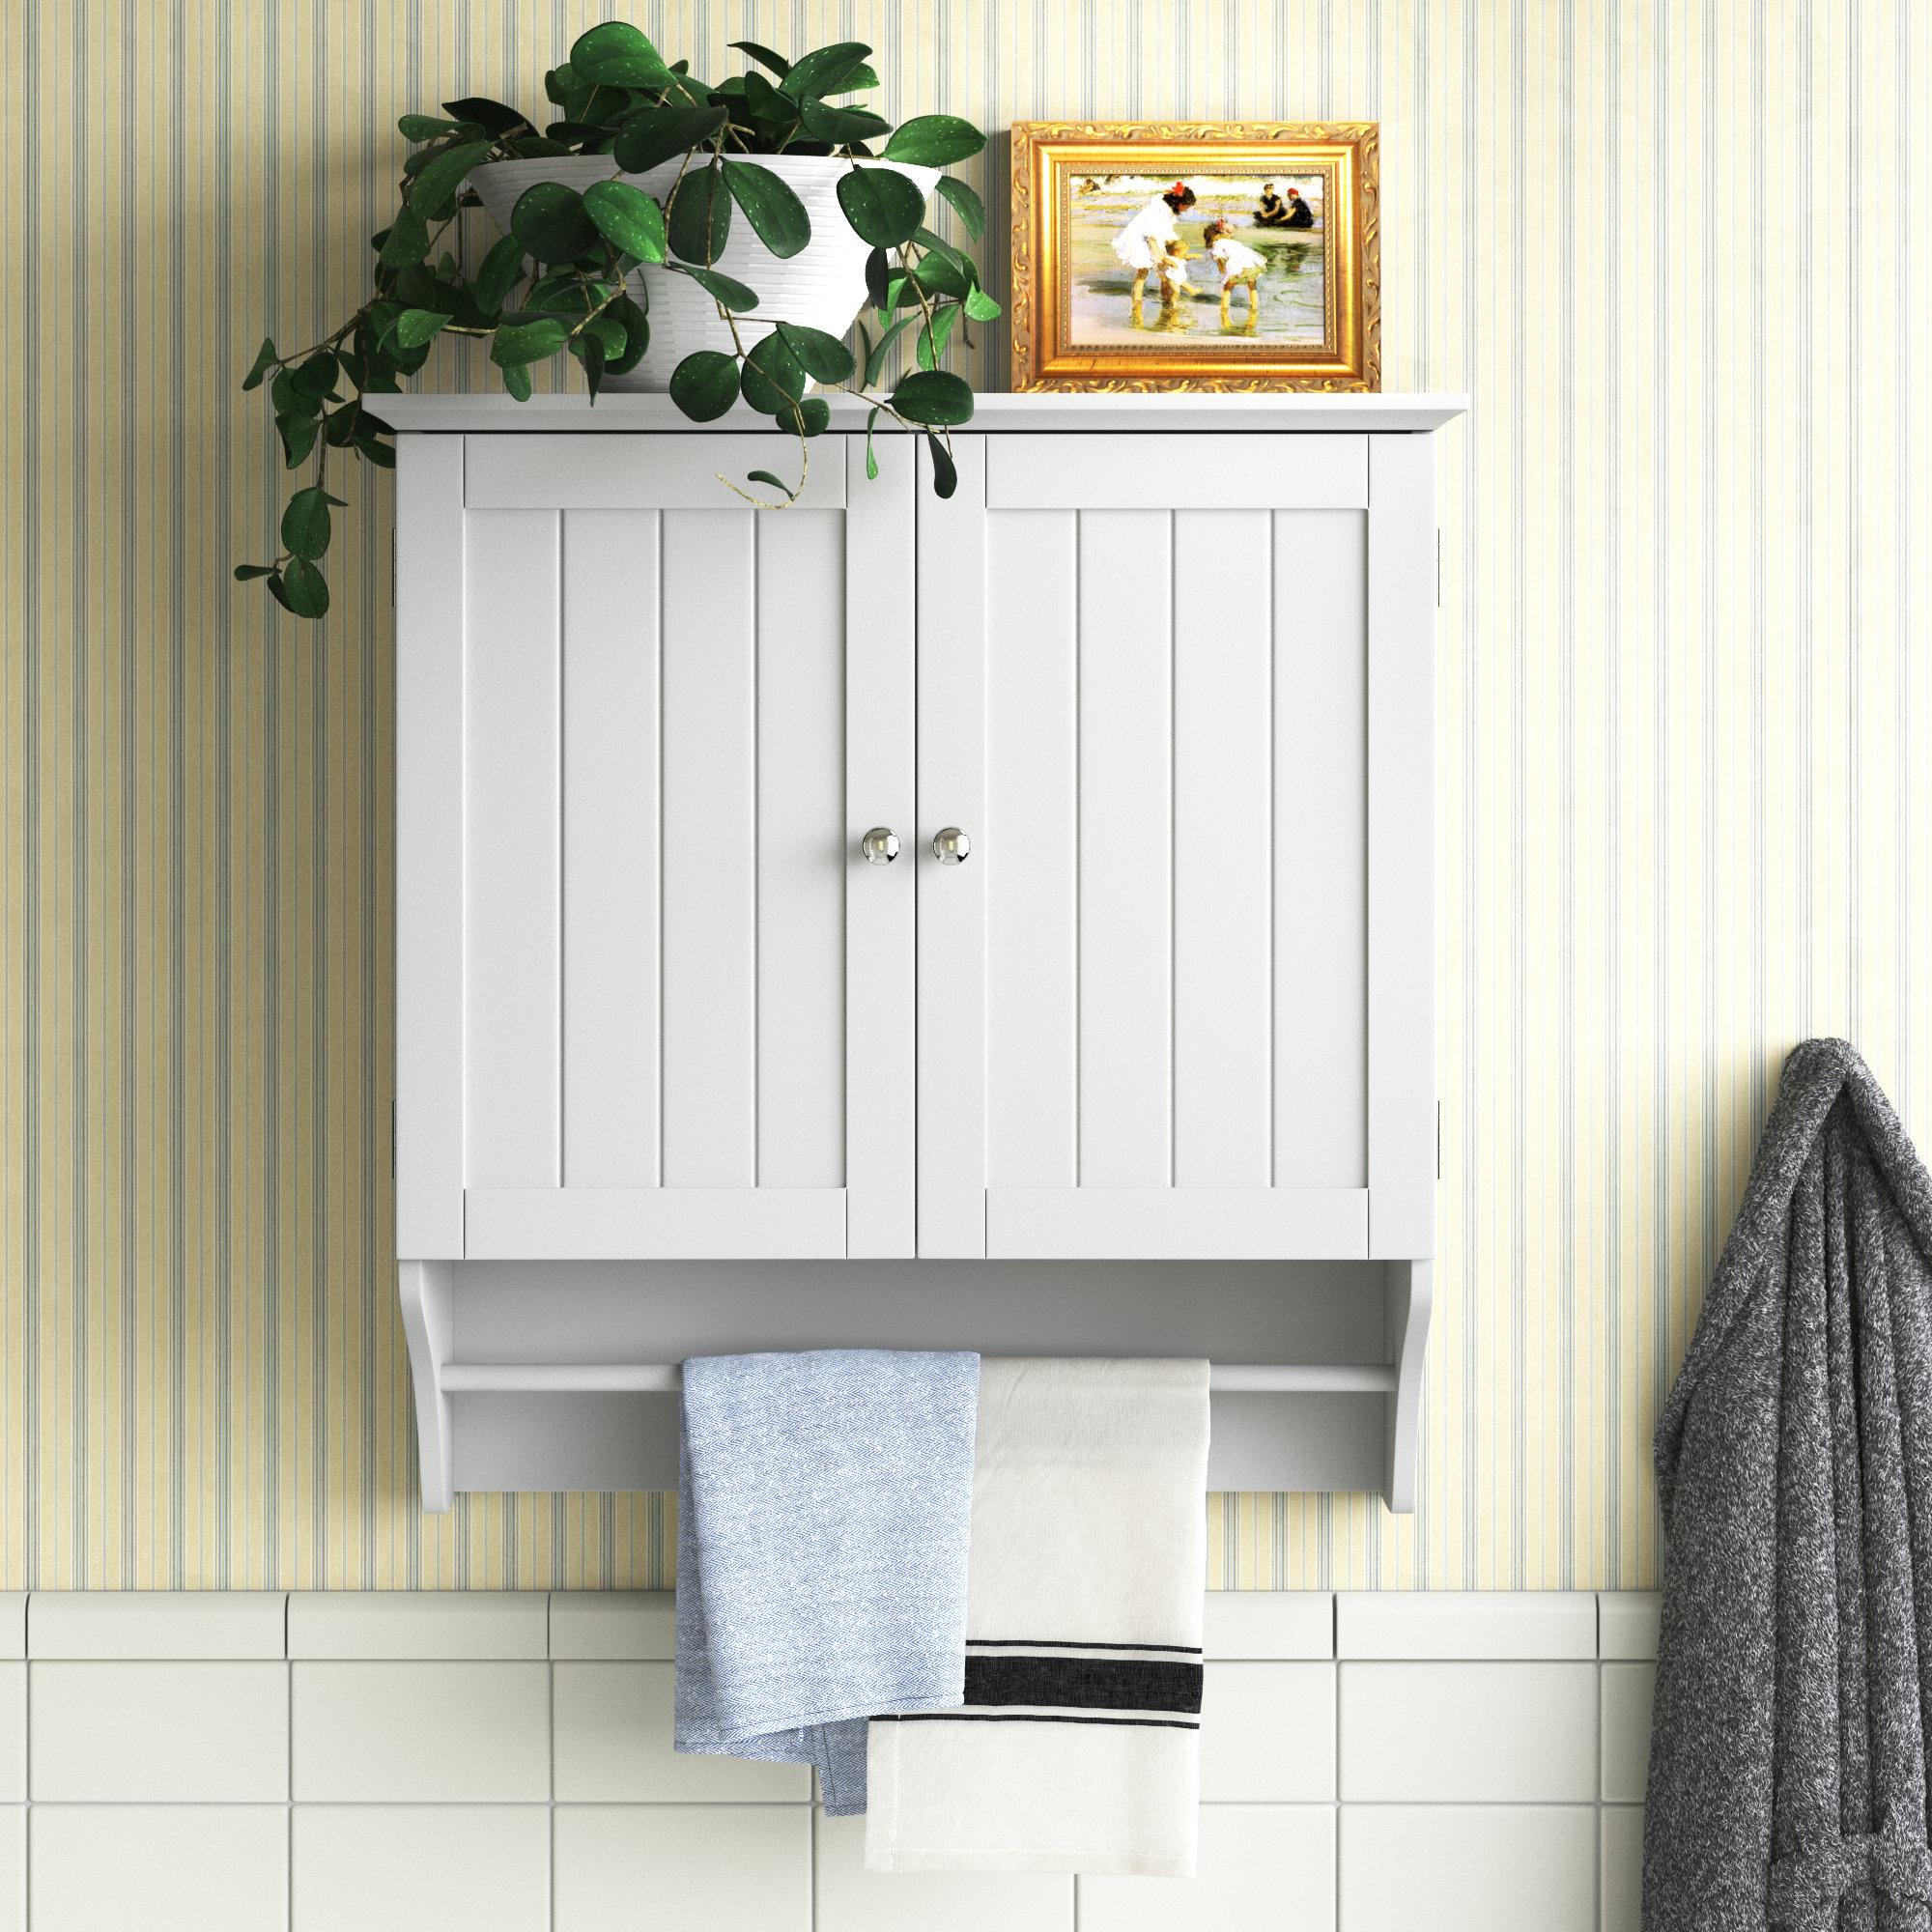 Andover Mills Ashland 23 8 W X 25 4 H X 8 86 D Wall Mounted Bathroom Cabinet Reviews Wayfair